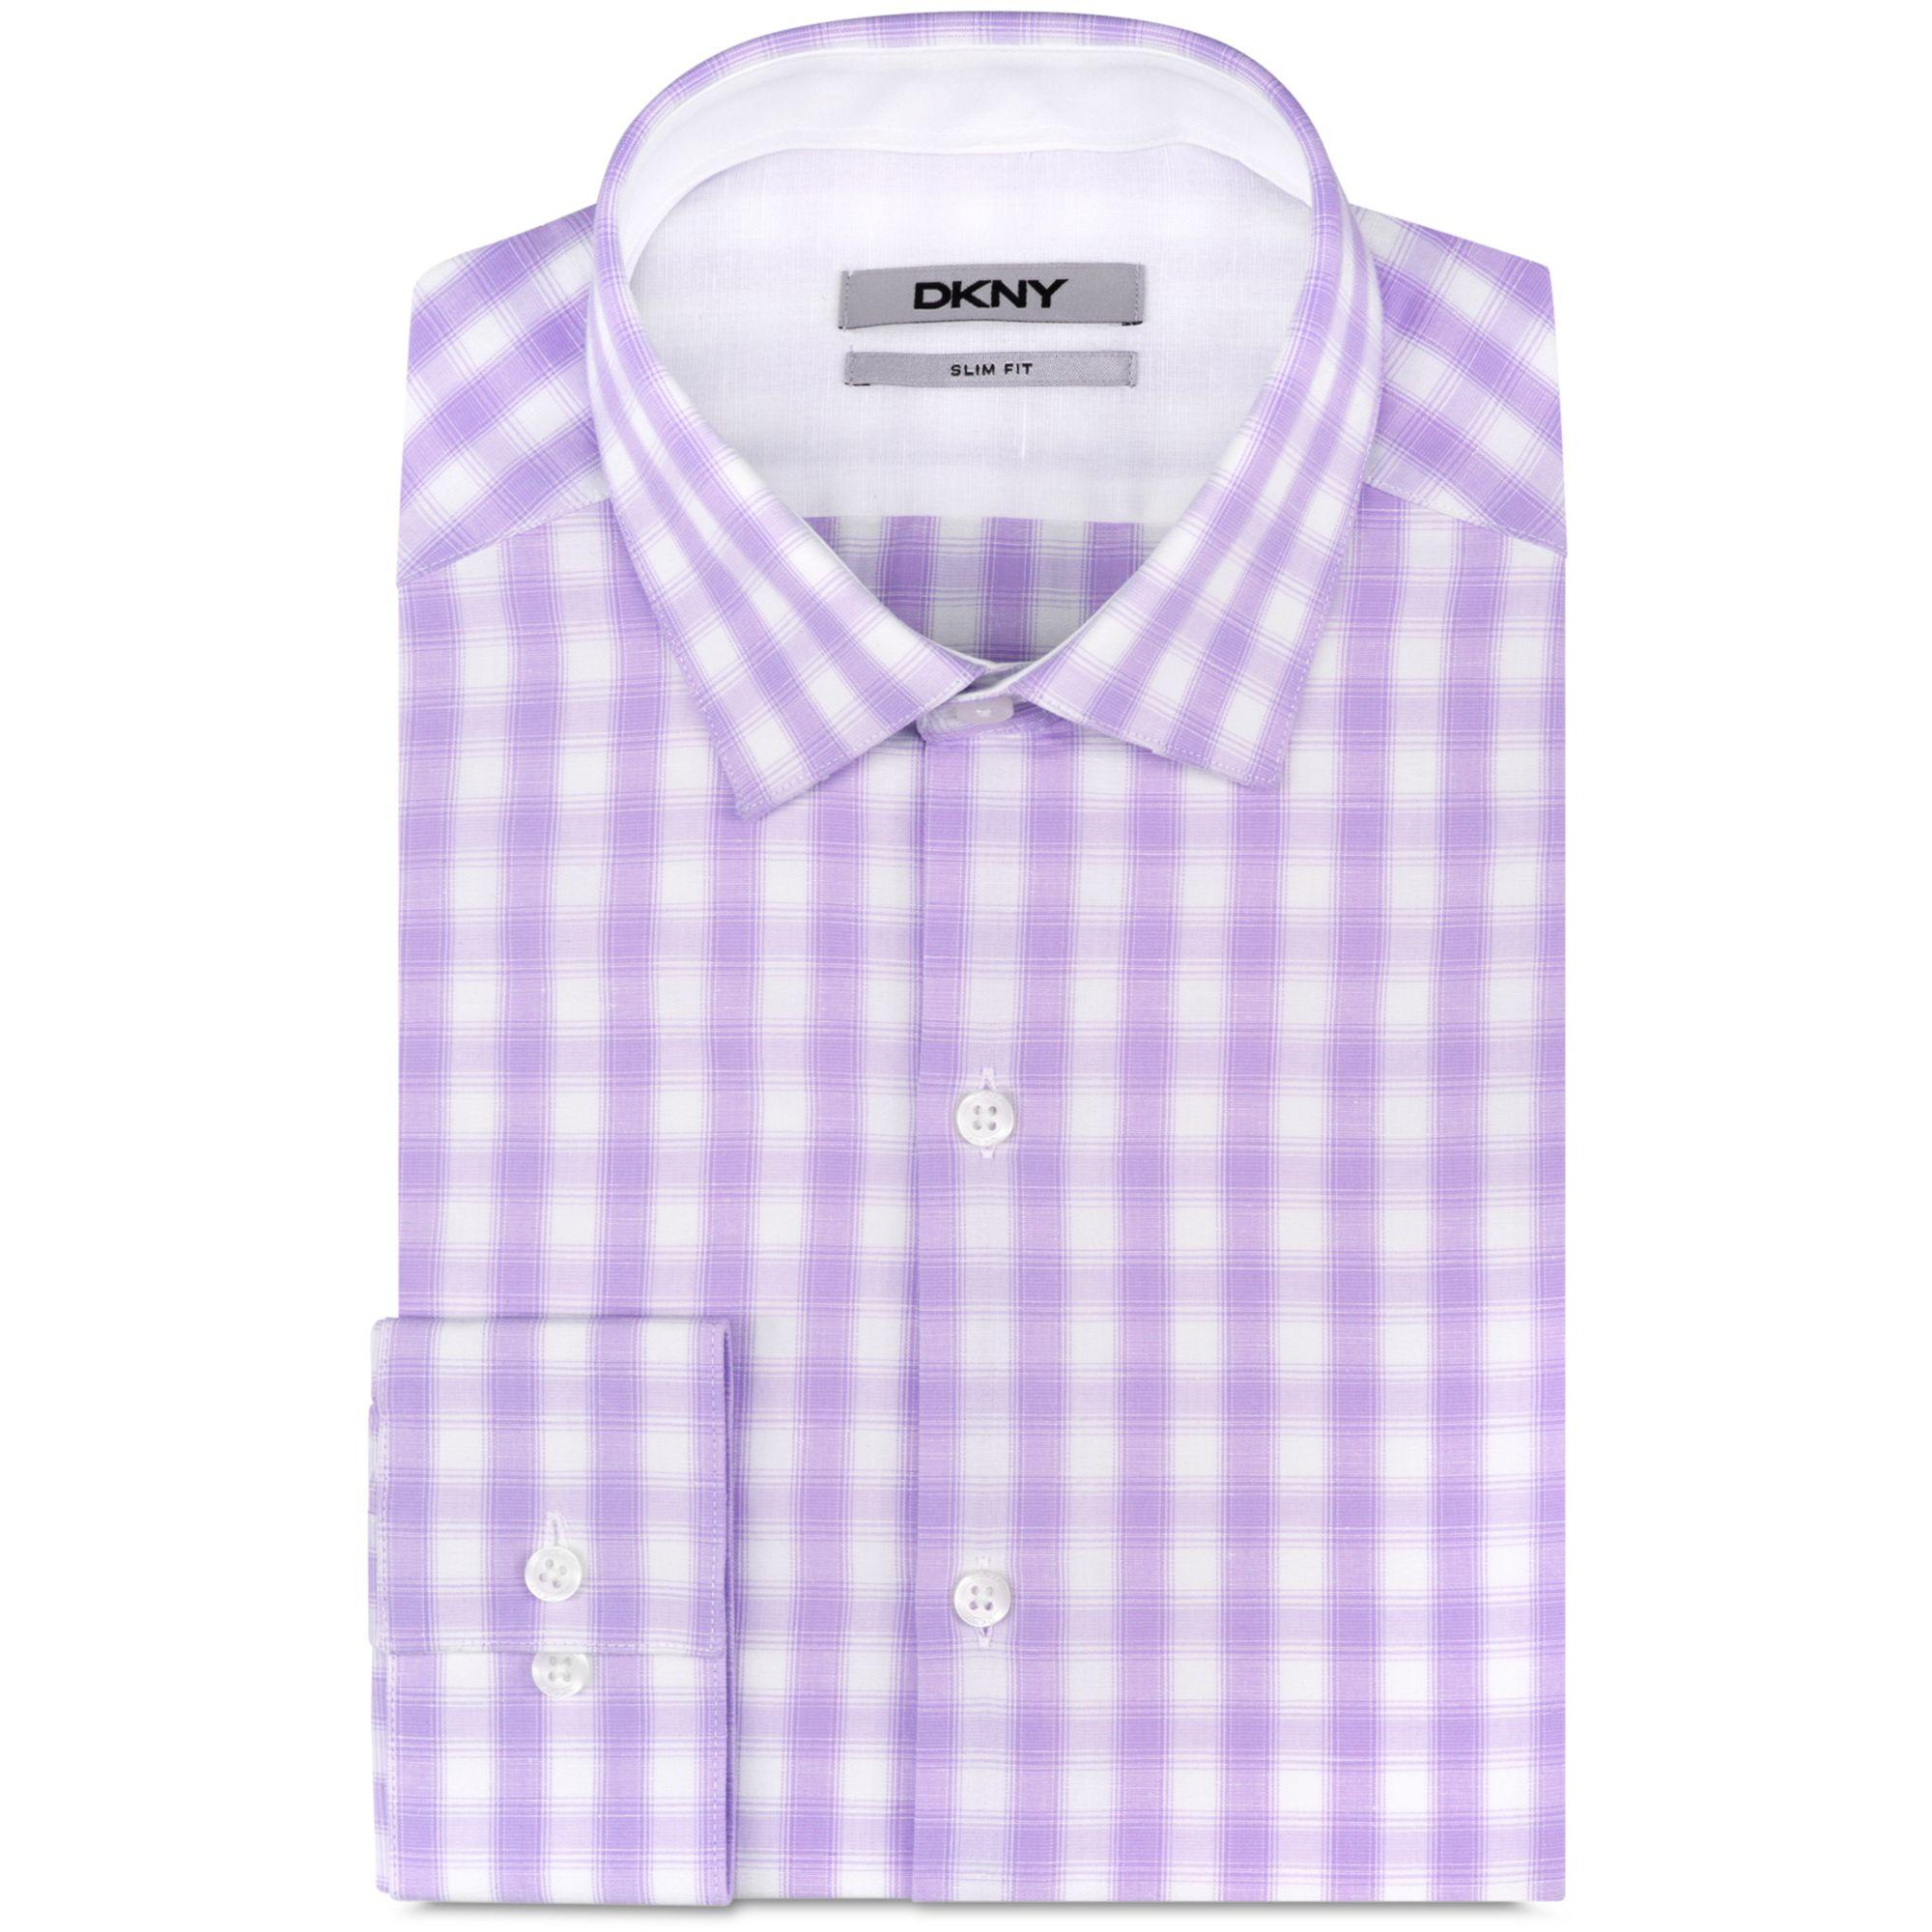 Dkny Slim Fit Linen Blend Large Plaid Dress Shirt In